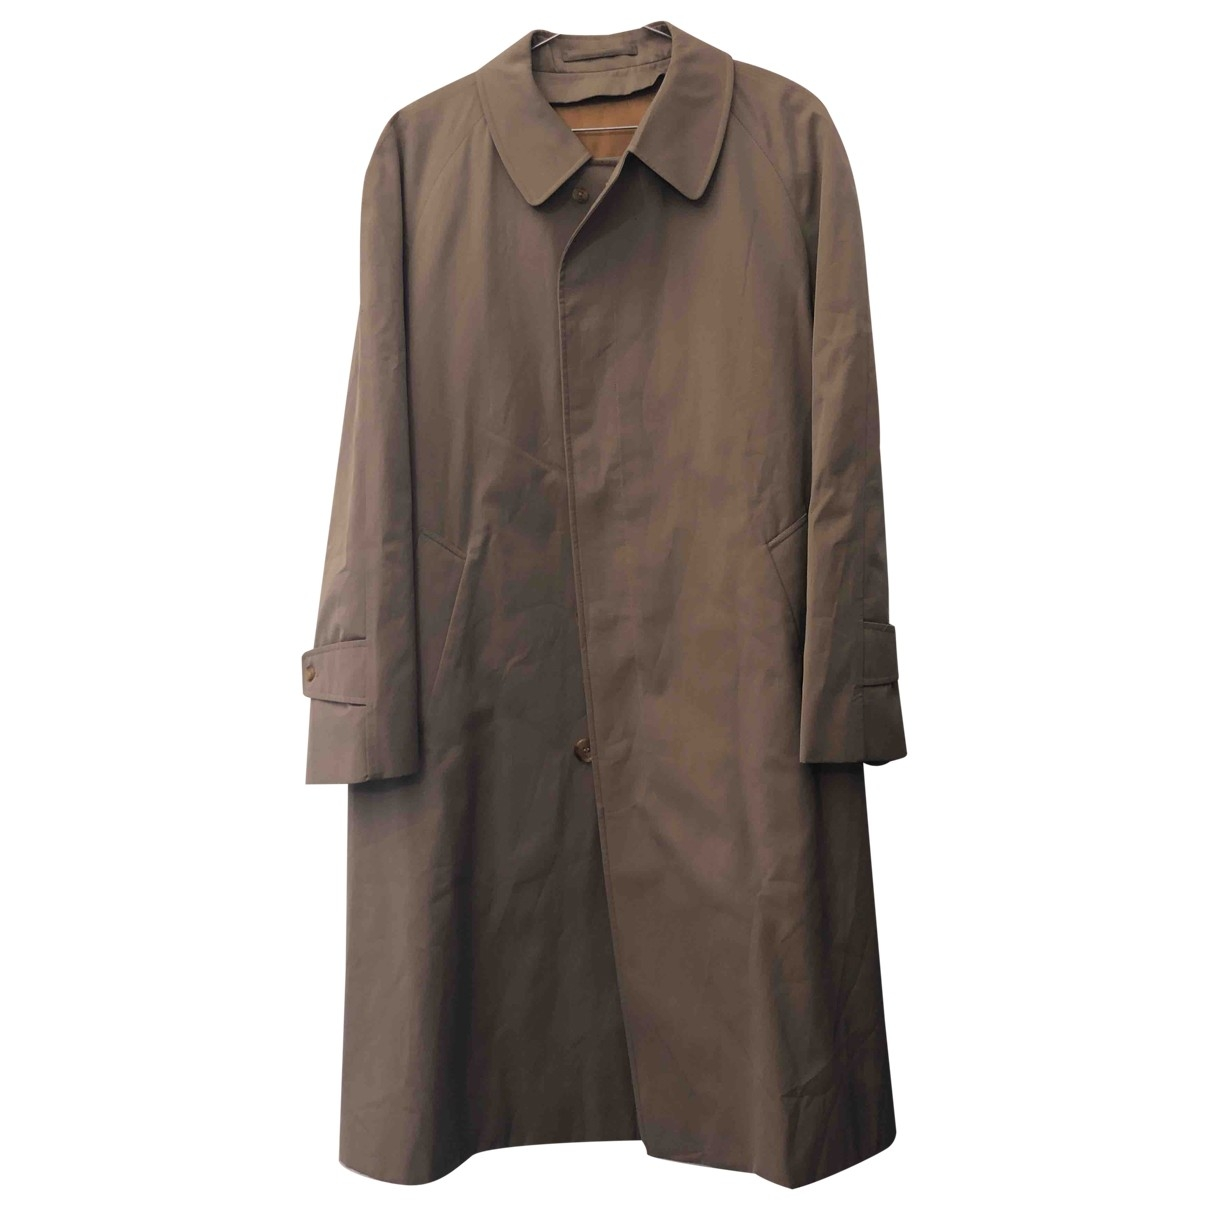 Aquascutum \N Beige Cotton coat  for Men 38 UK - US